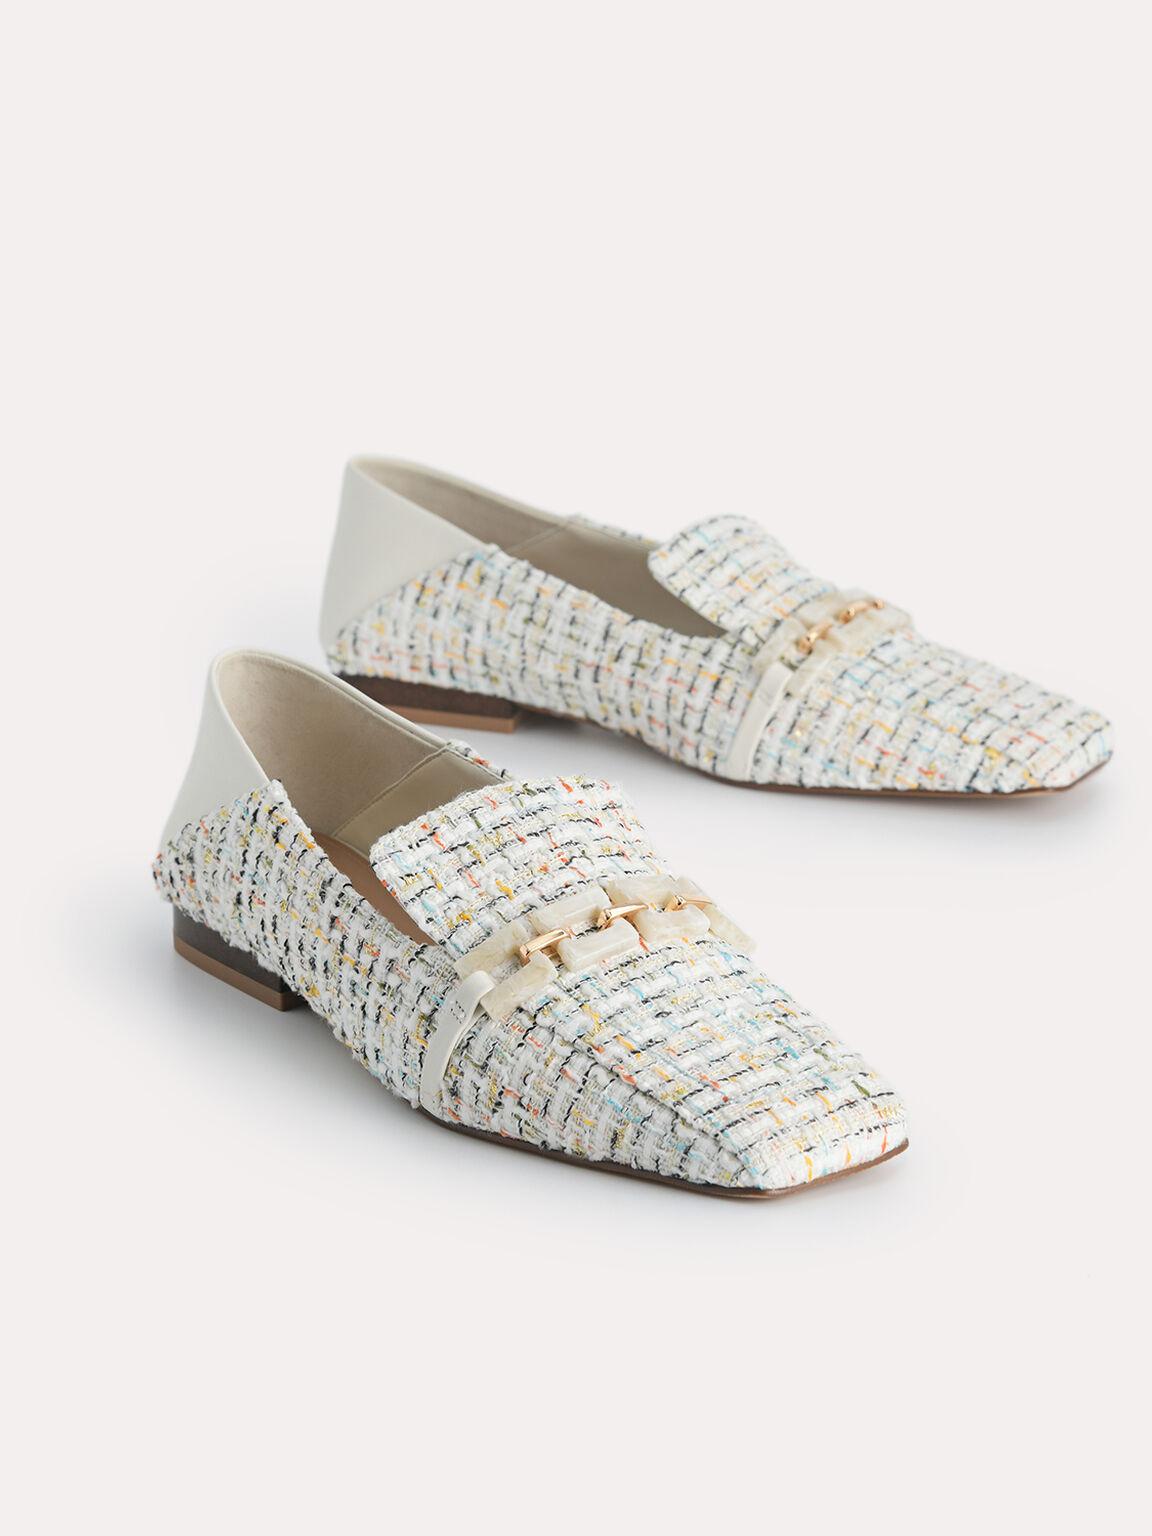 Tweed Square Toe Loafers, Multi, hi-res